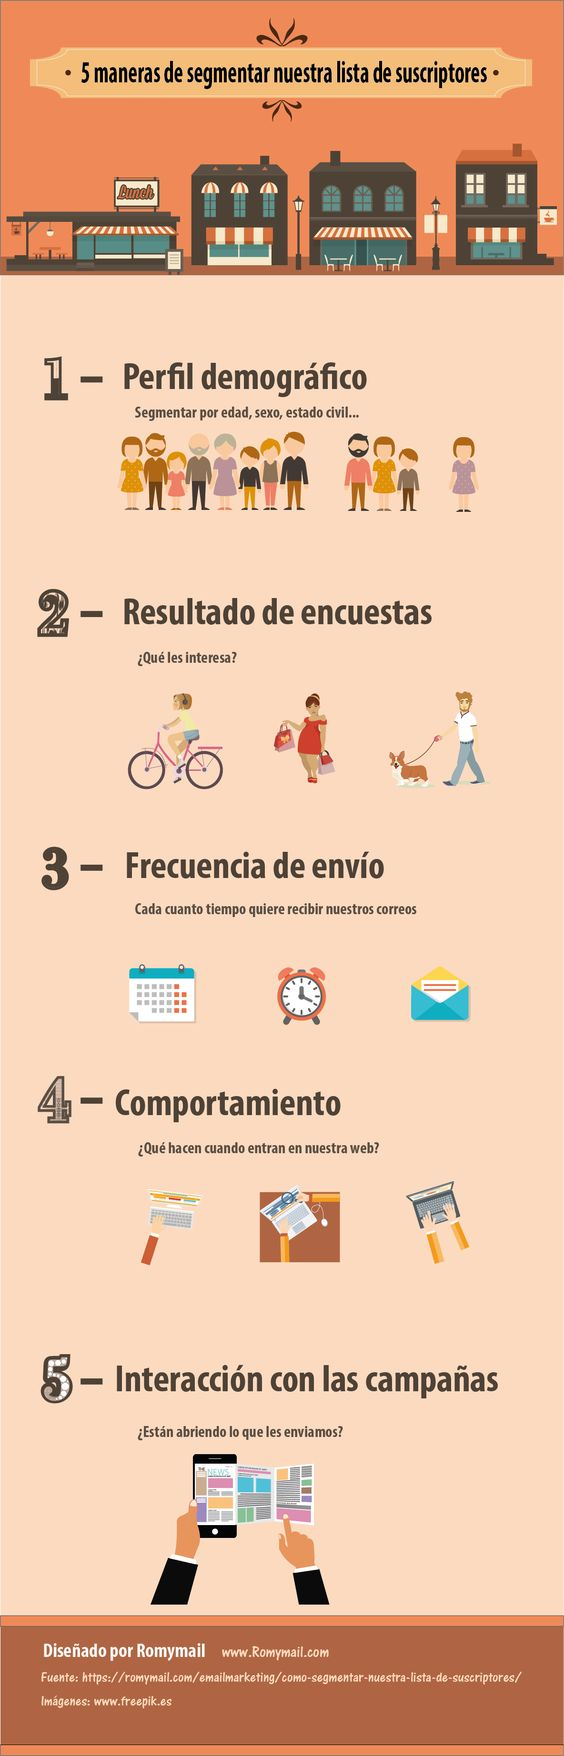 las-mejores-bases-de-datos-de-emails-en-espana-infografia